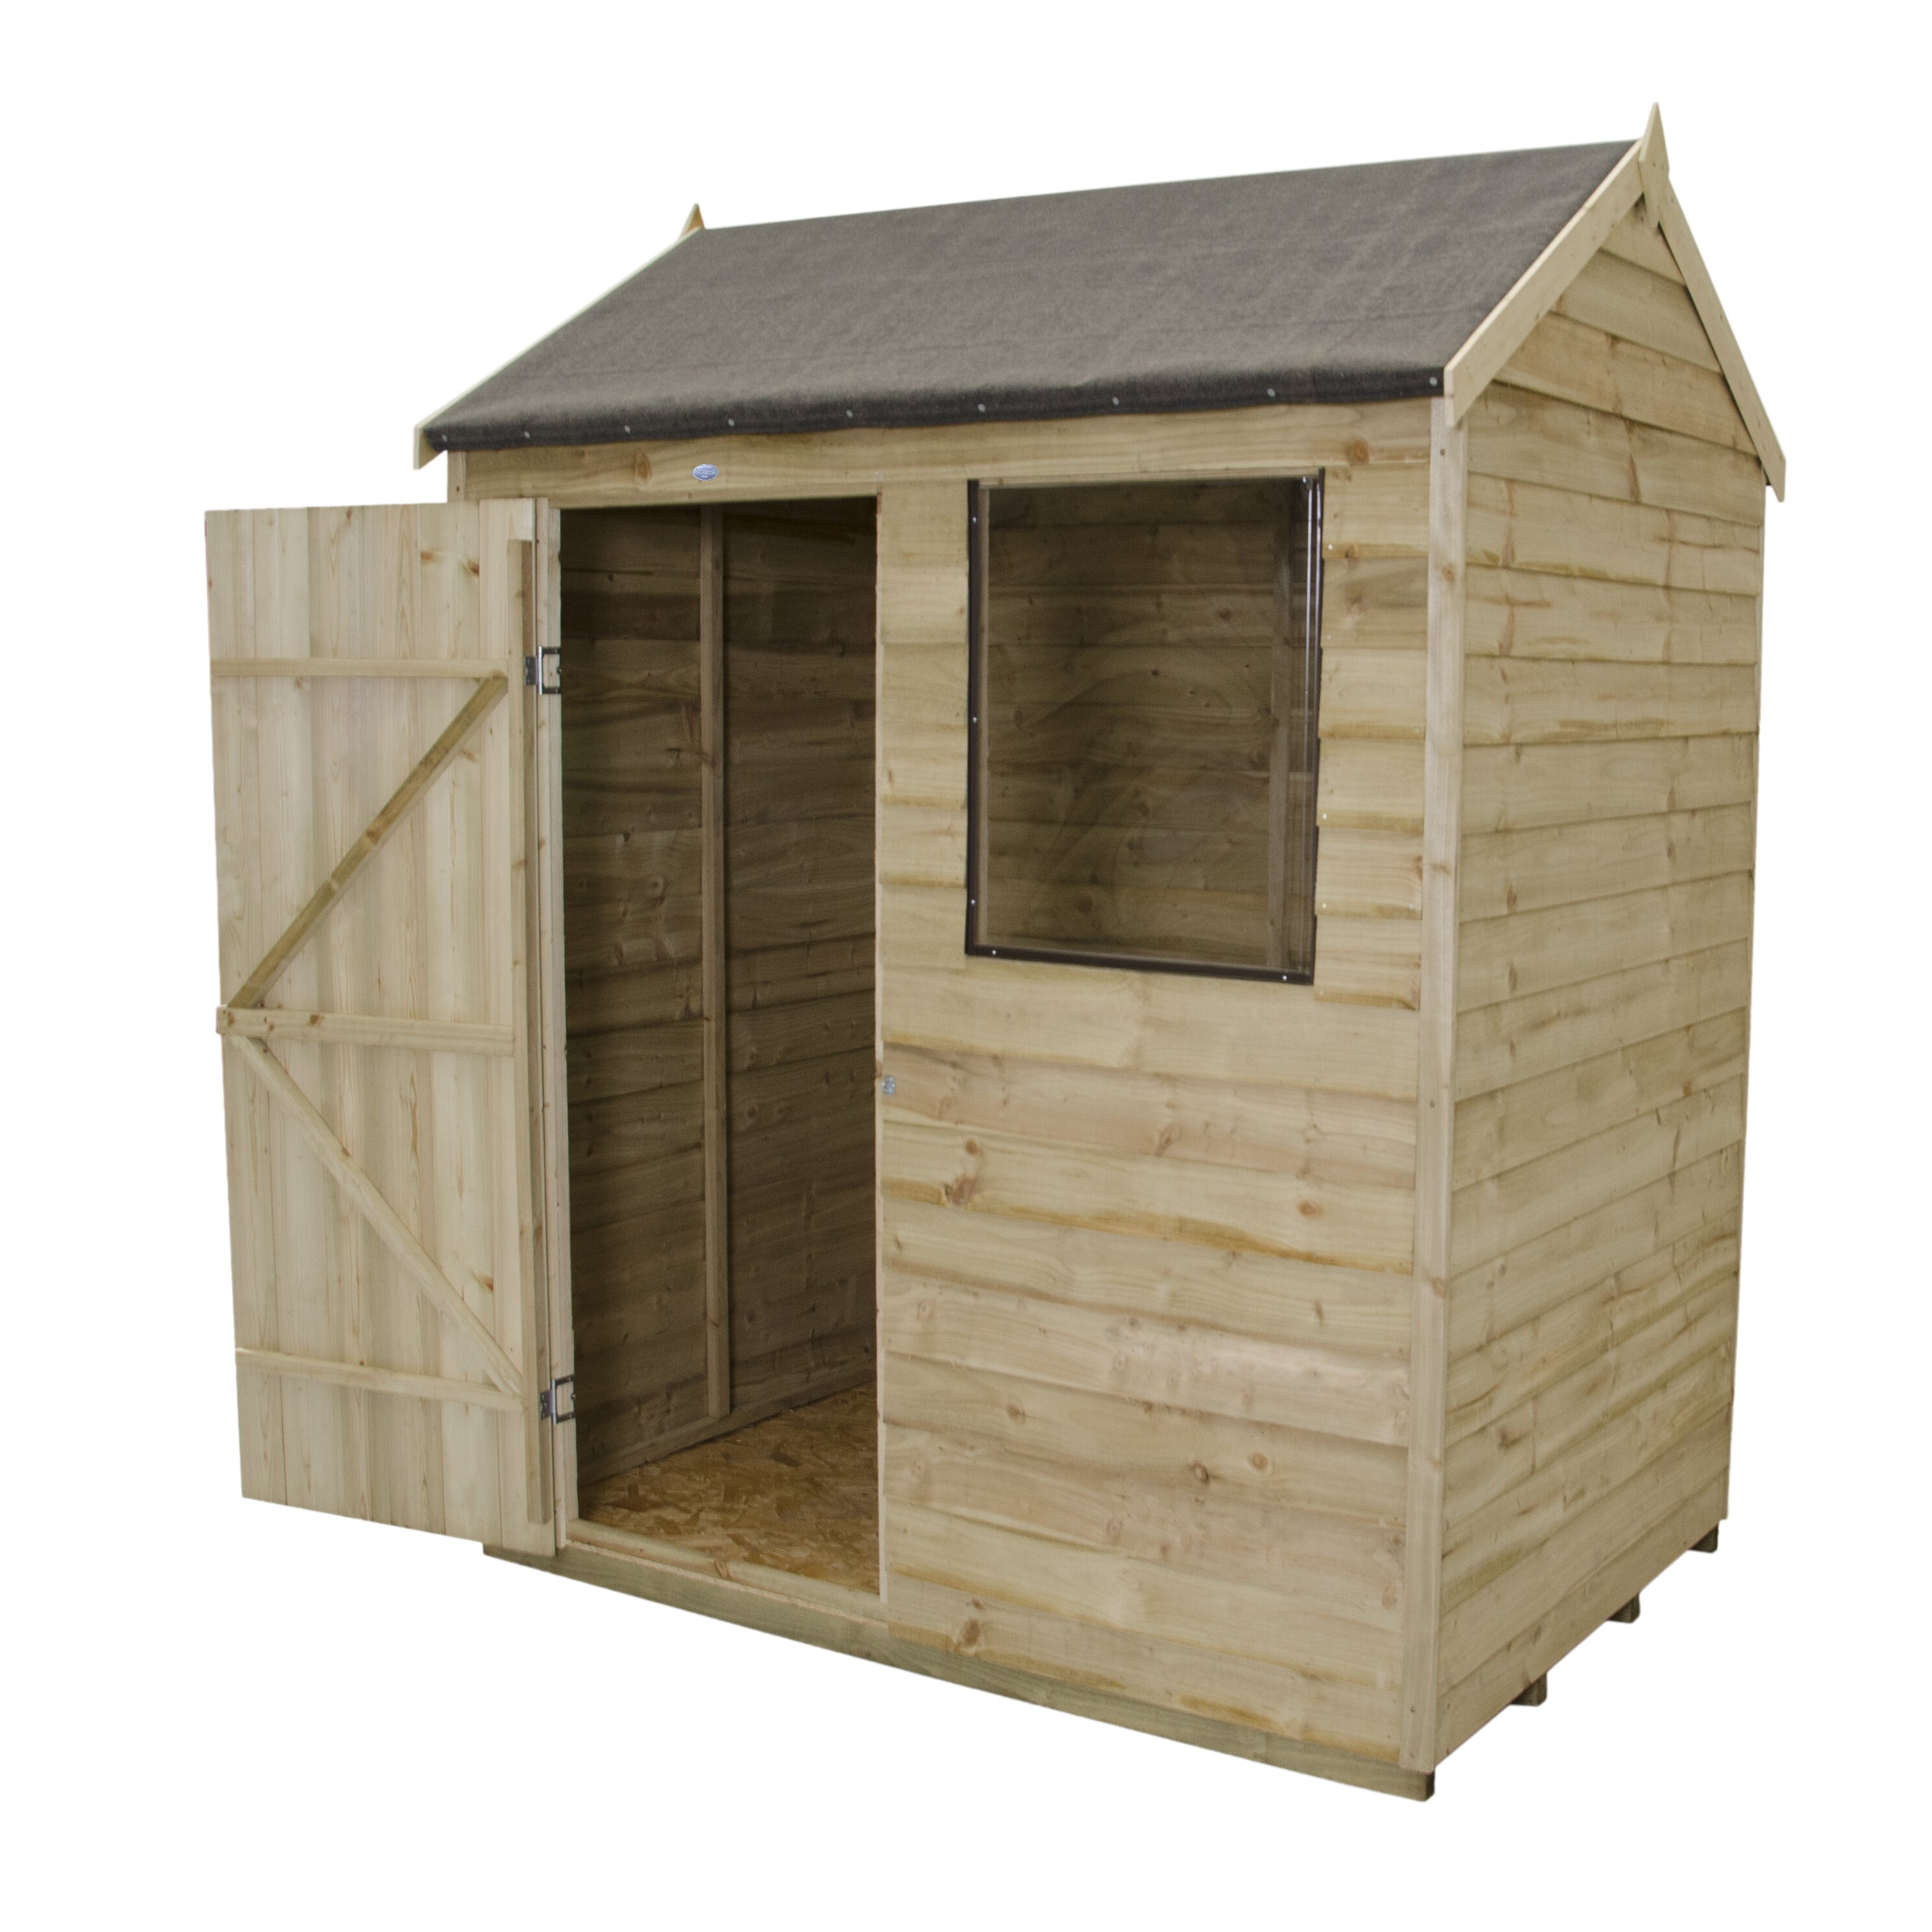 Forest garden 6 x 4 wooden storage shed wayfair uk for Garden shed 4 x 2